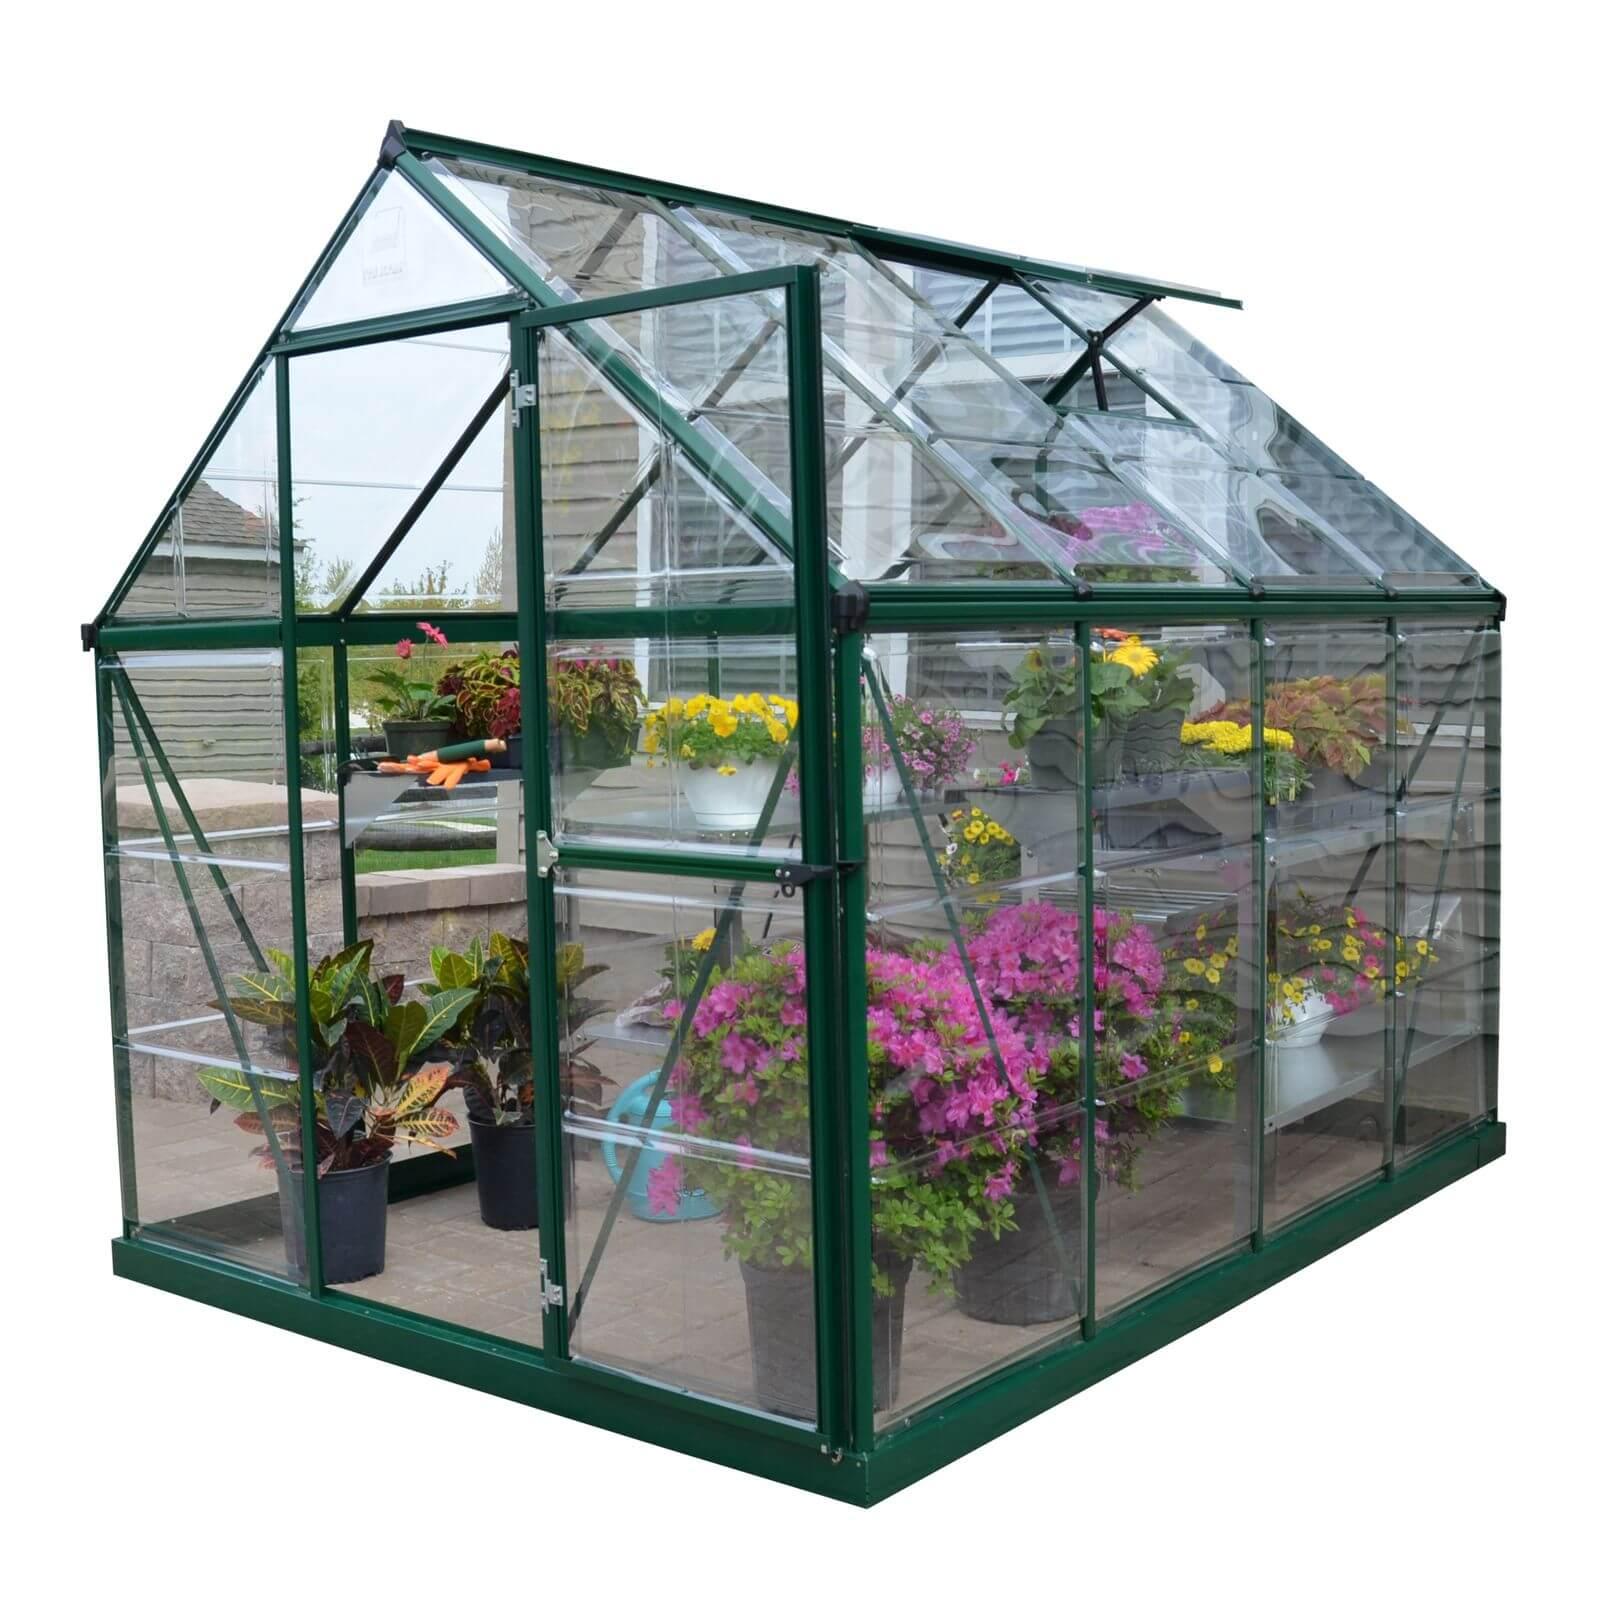 Palram Harmony Green Greenhouse - 6 x 8ft